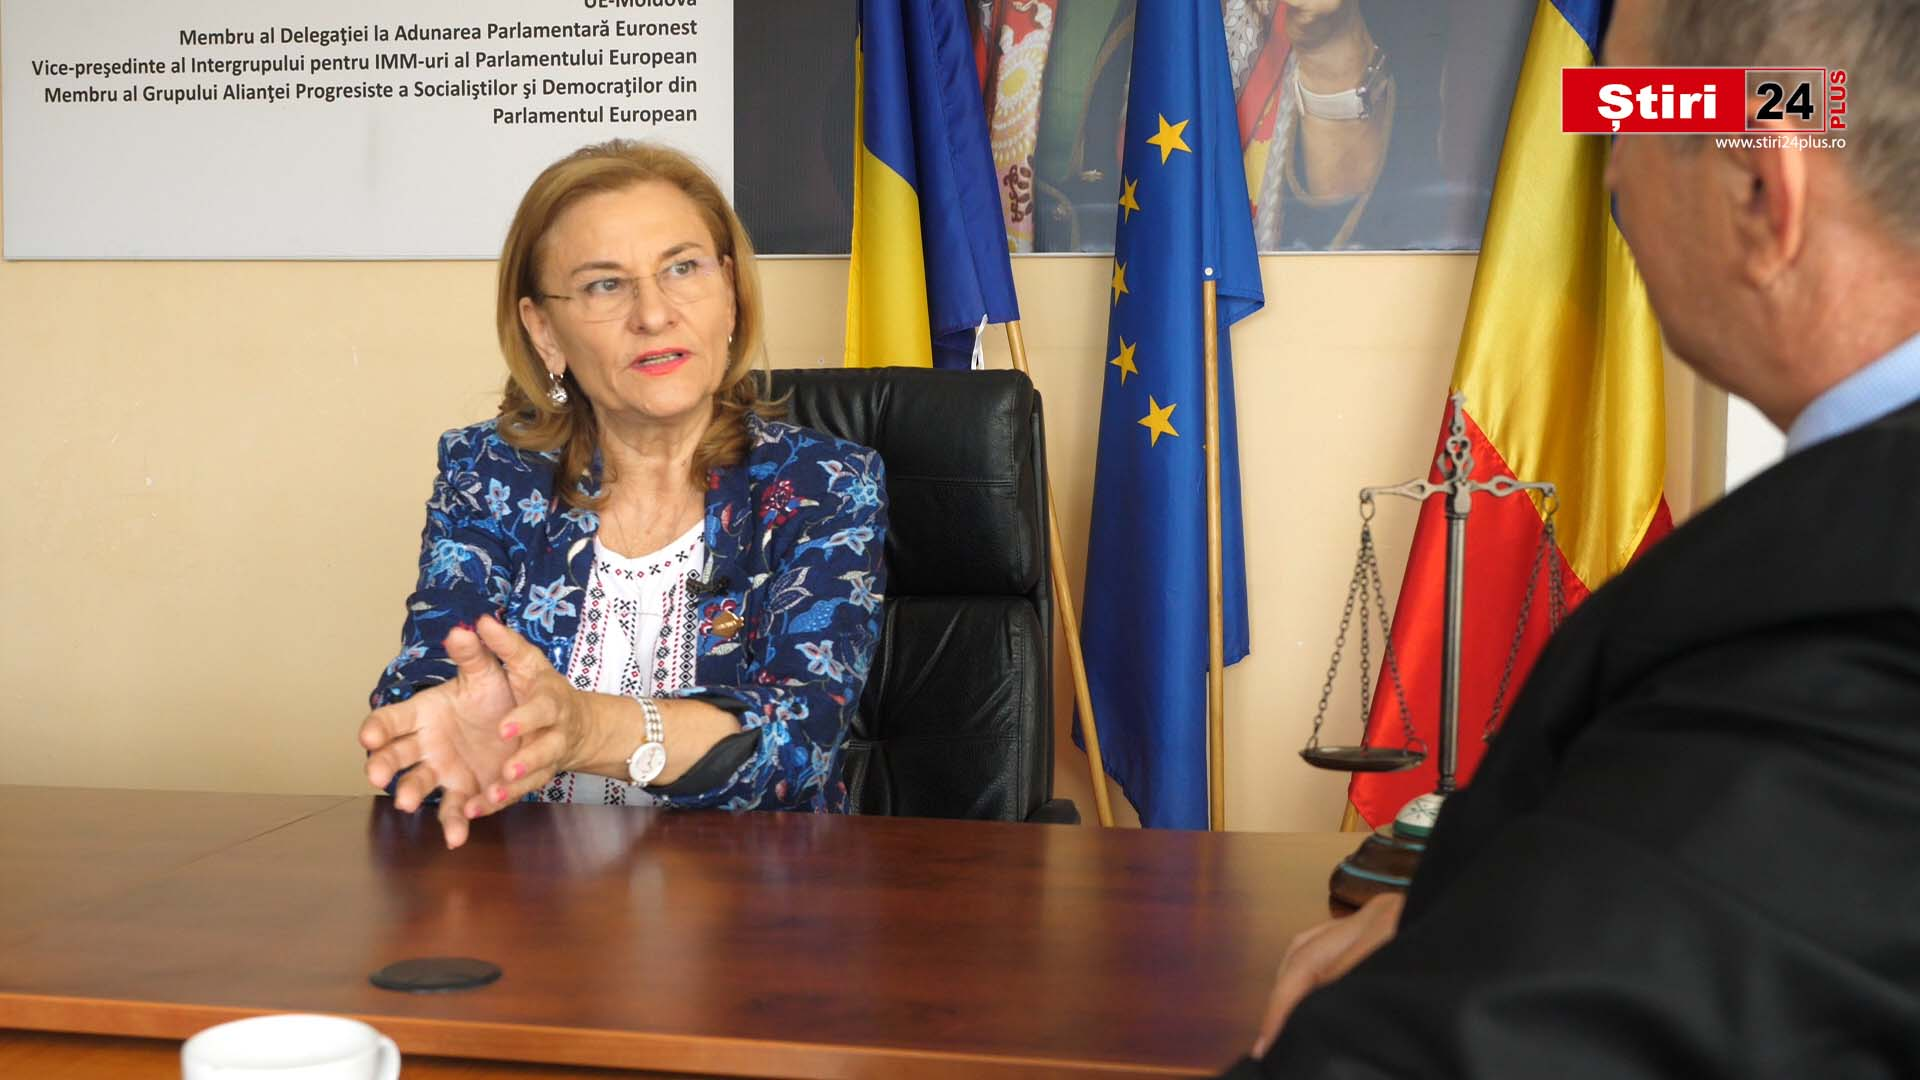 Interviu Stiri24 PLUS cu Maria Grapini – Informații din Parlamentul European